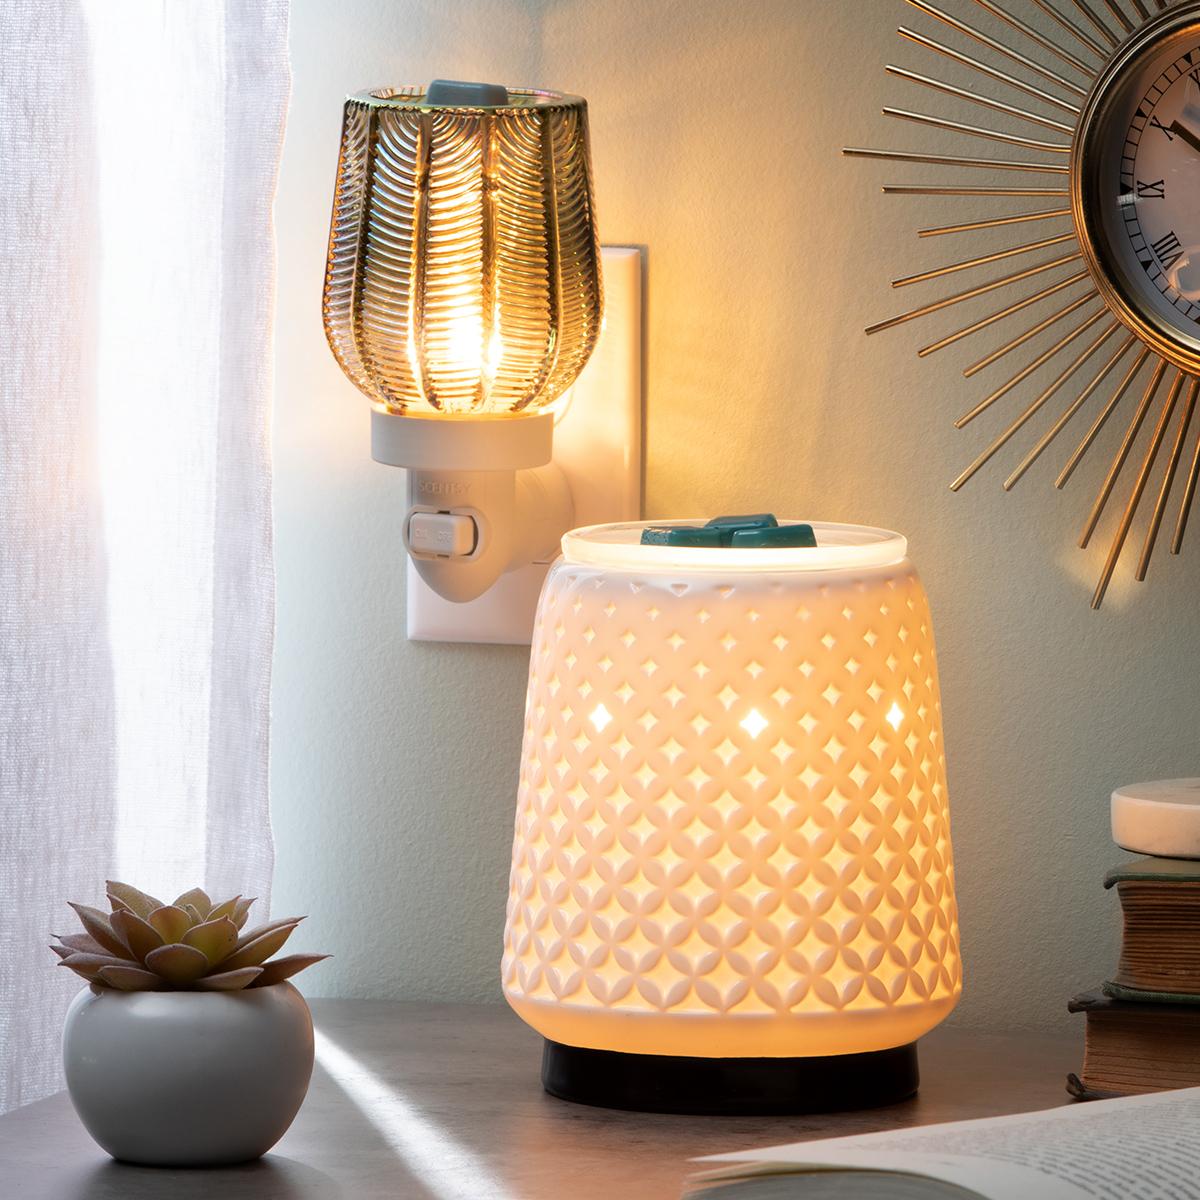 Gatsy Mini Scentsy Warmer Light from Within Scentsy Warmer   NEW! Gatsby Mini Scentsy Warmer   Incandescent.Scentsy.us